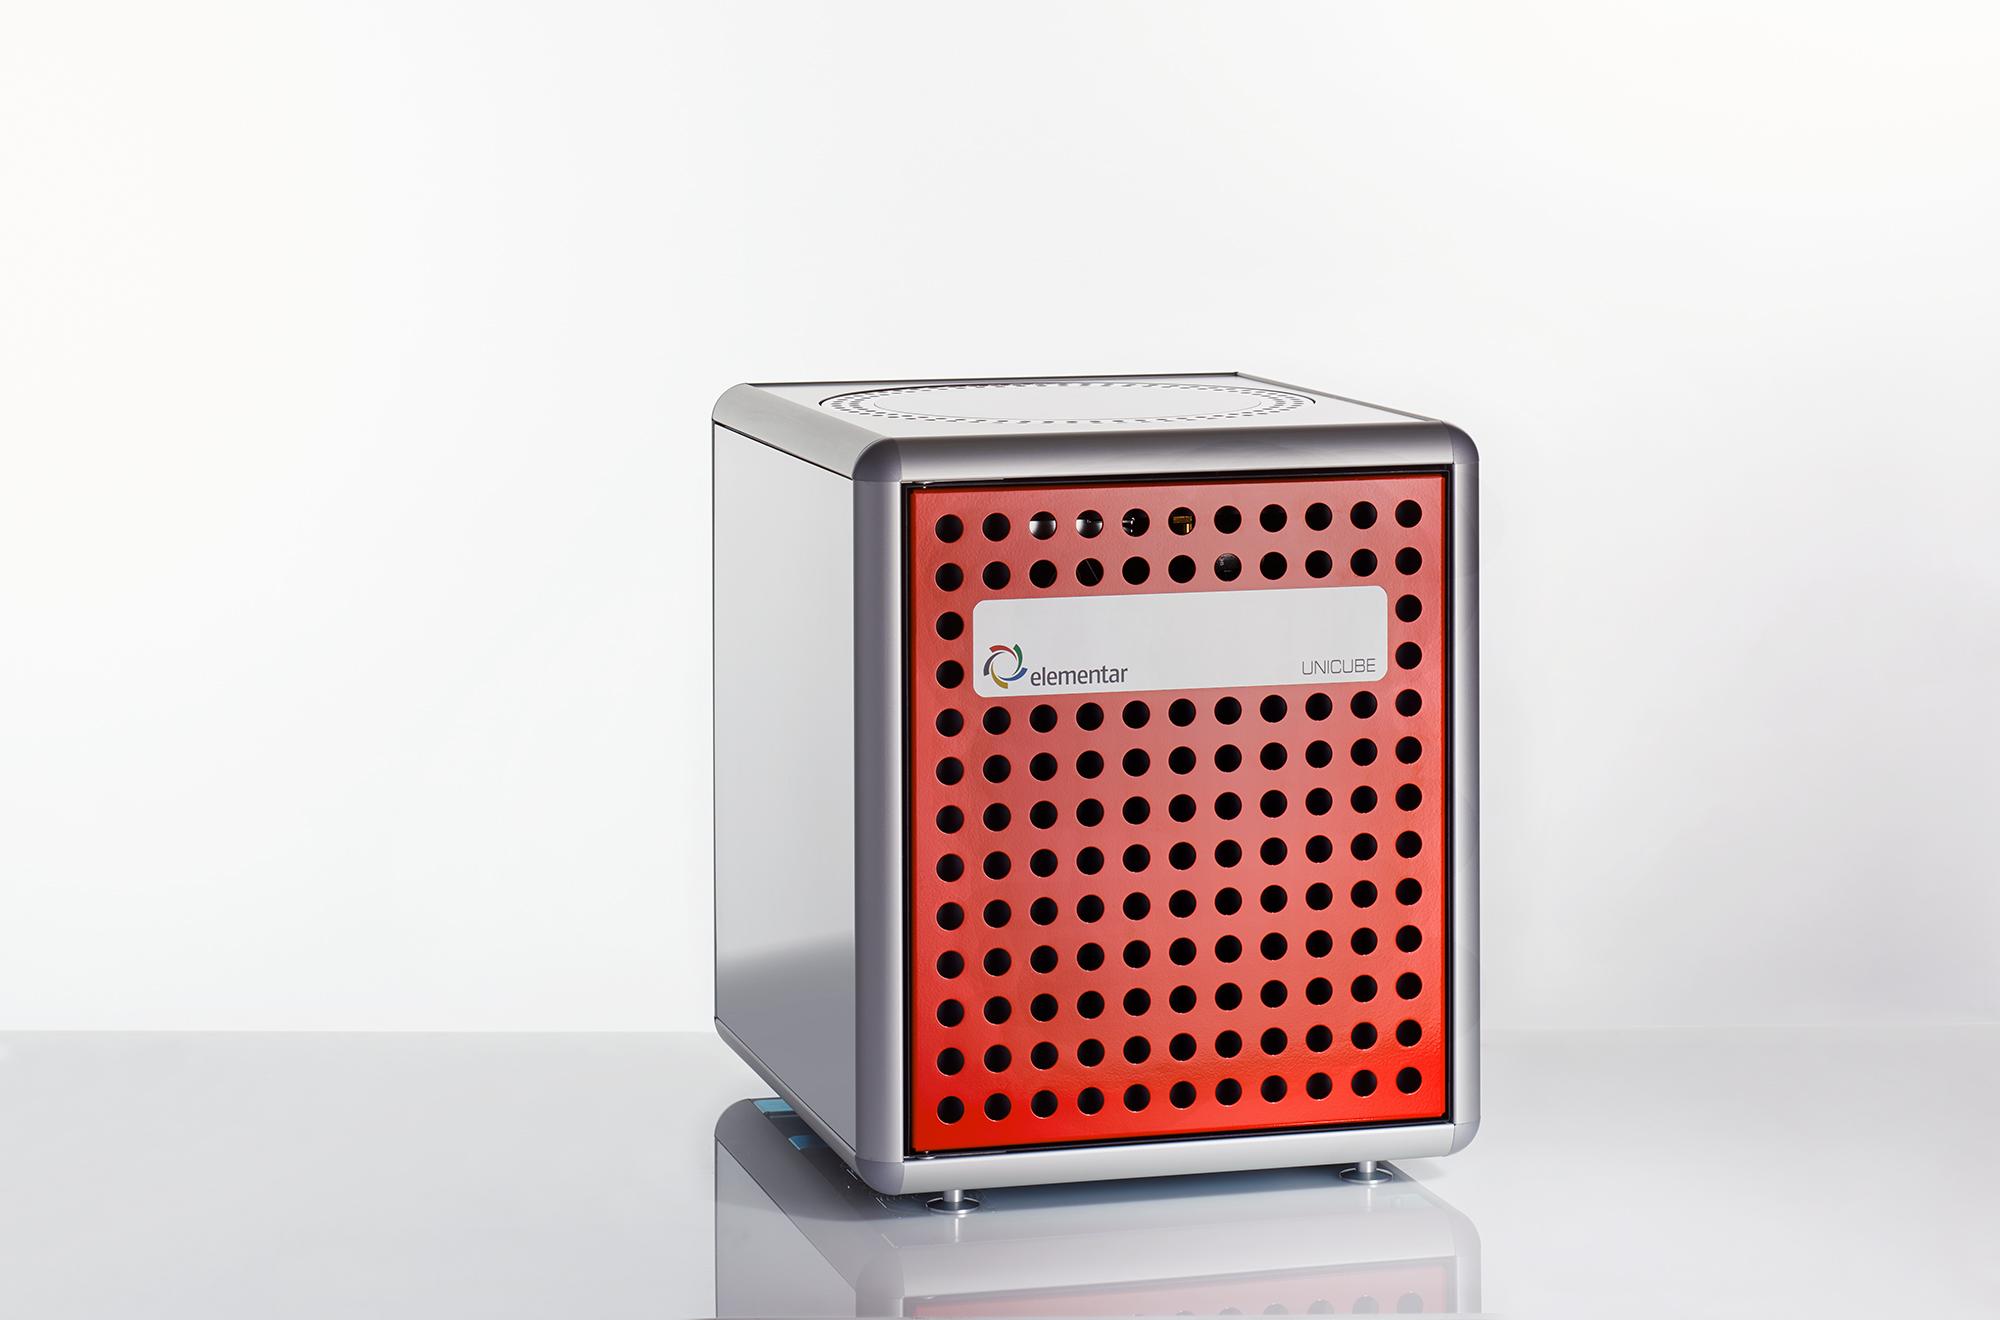 Analizador Elemental para Micromuestras UNICUBE Image